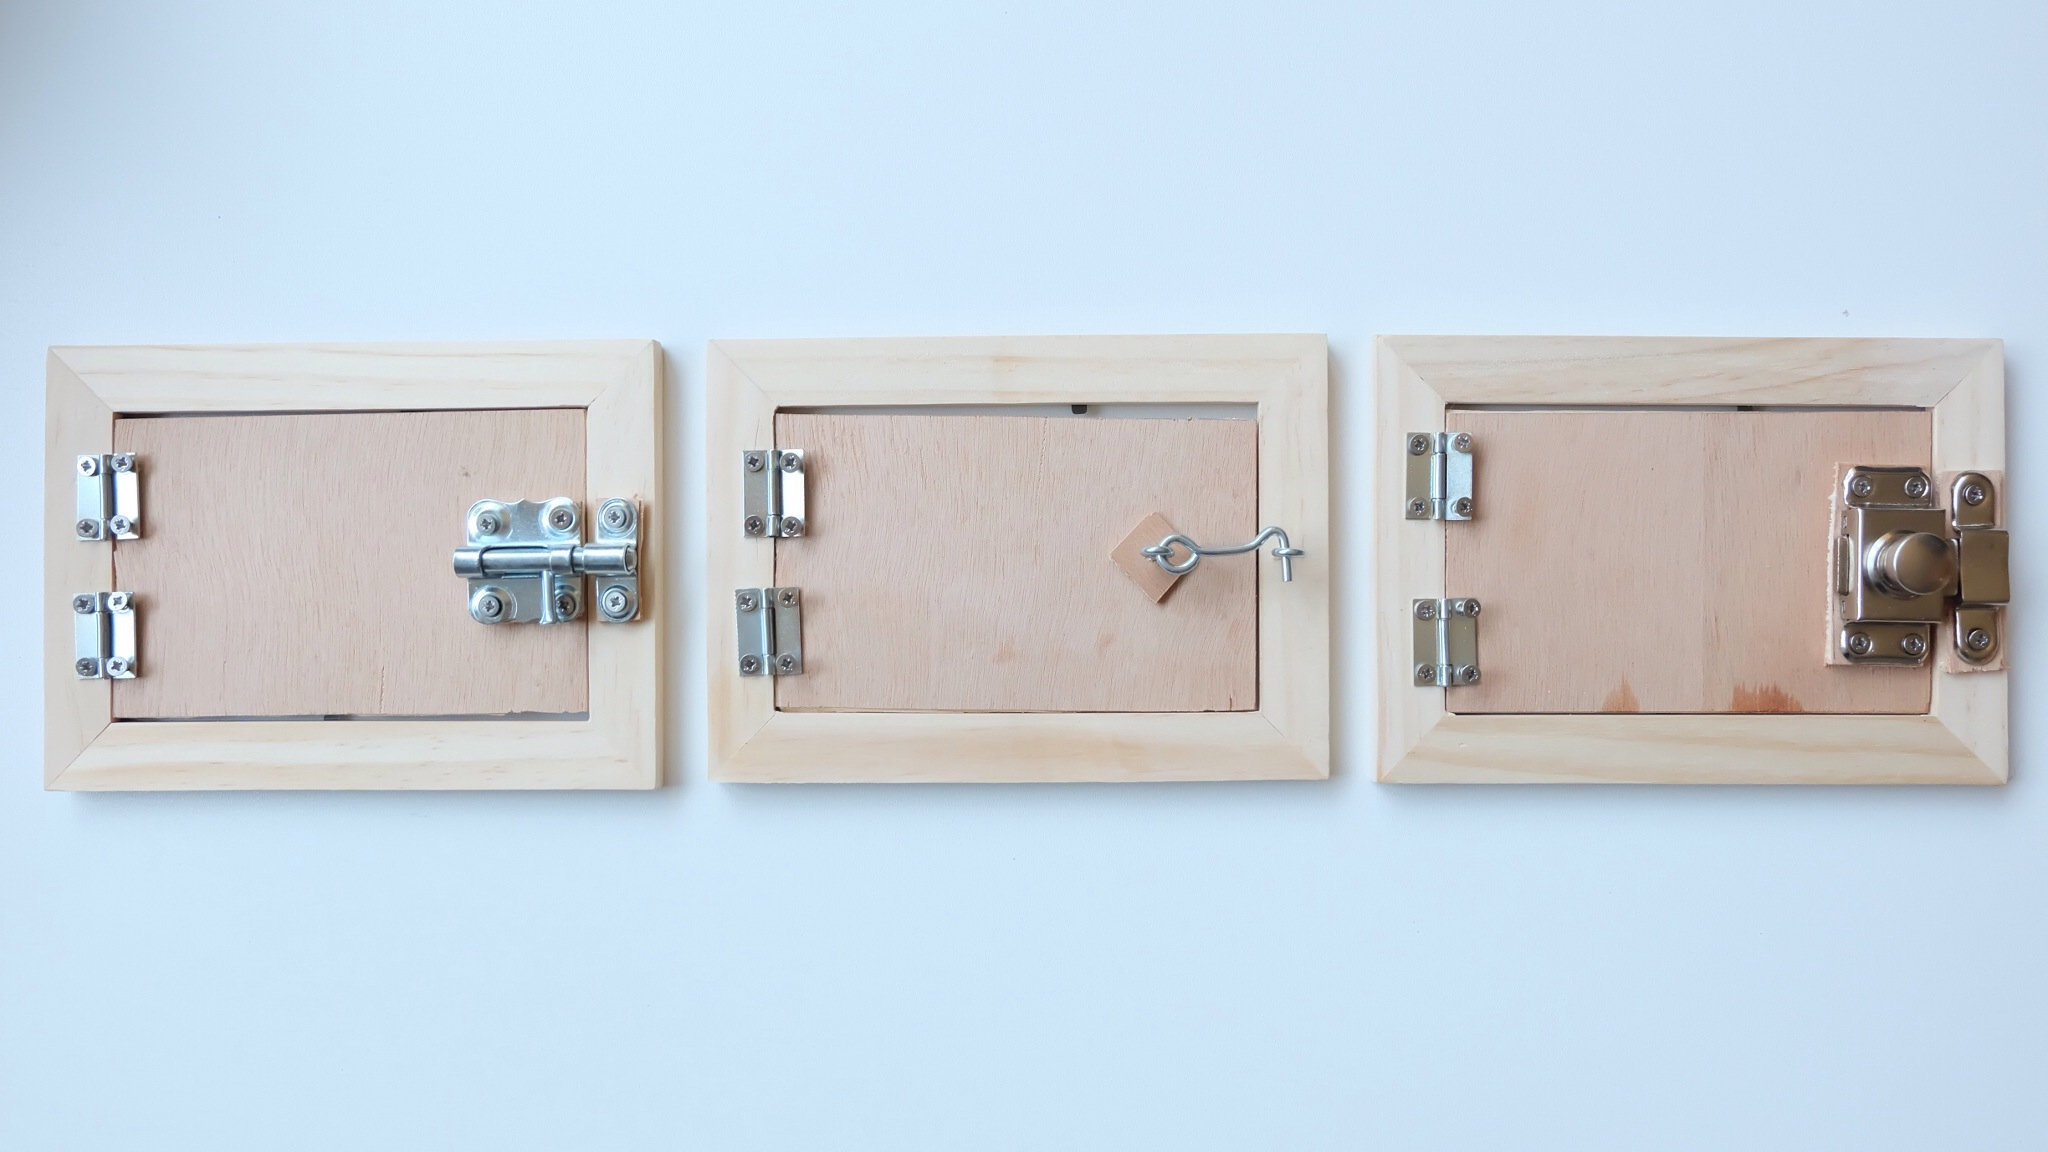 fabriquer maison des serrures montessori avie home. Black Bedroom Furniture Sets. Home Design Ideas